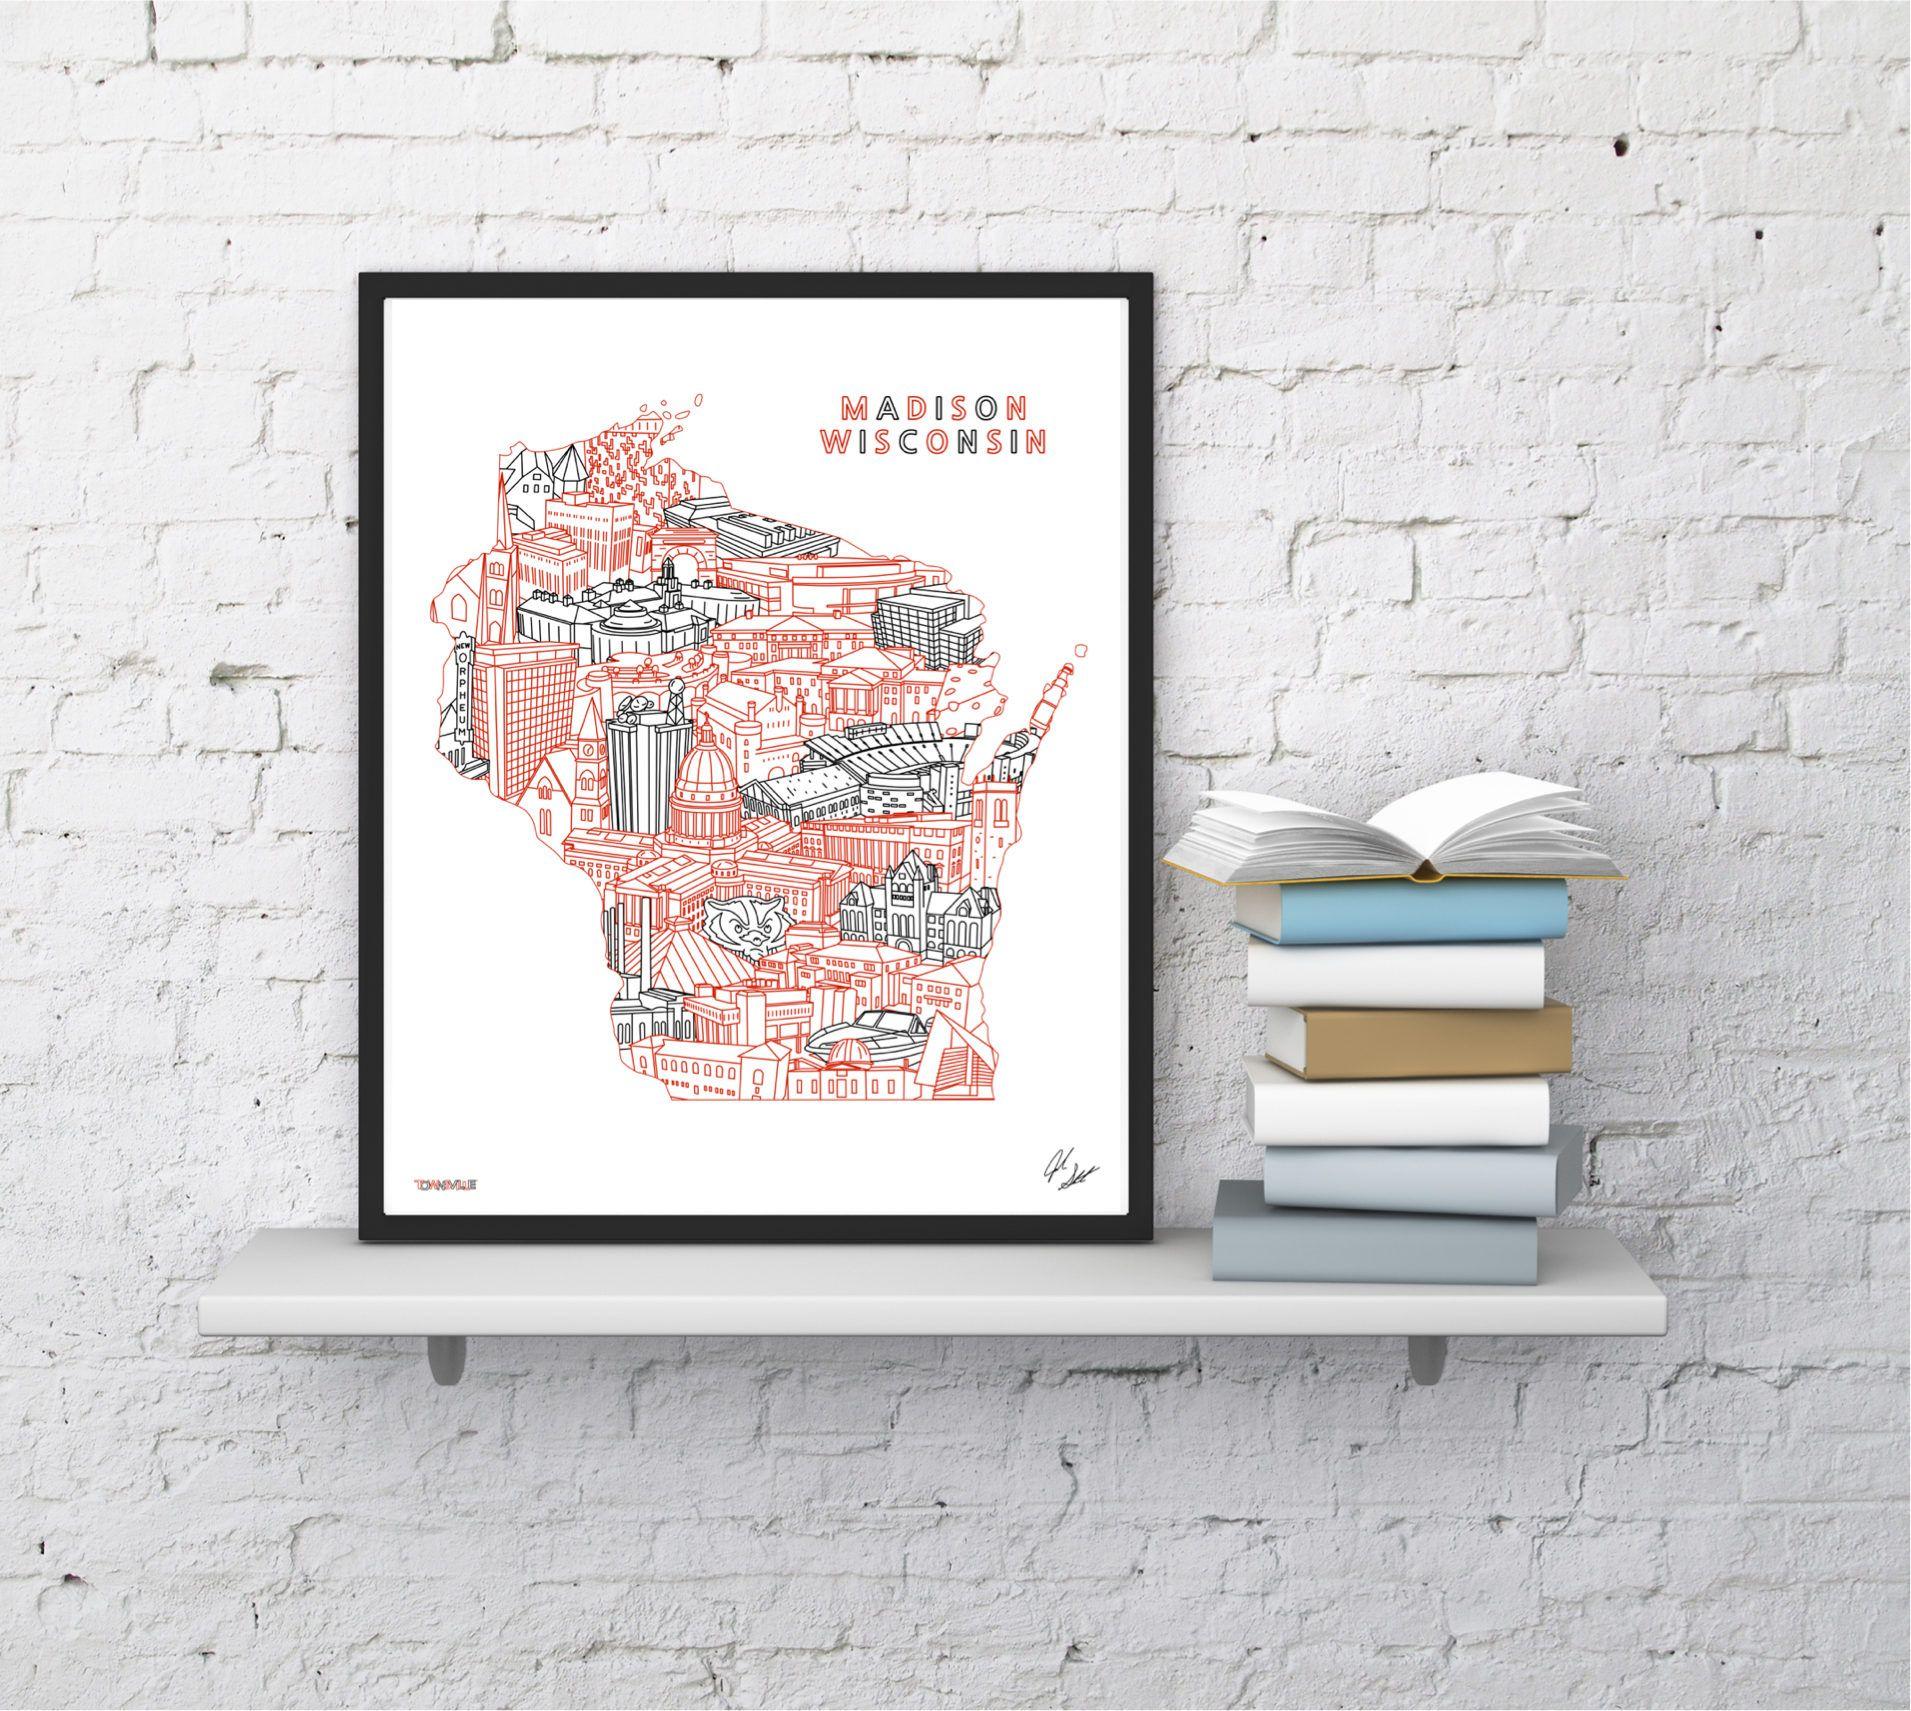 Madison wisconsin skyline landmarks cityscape art print by